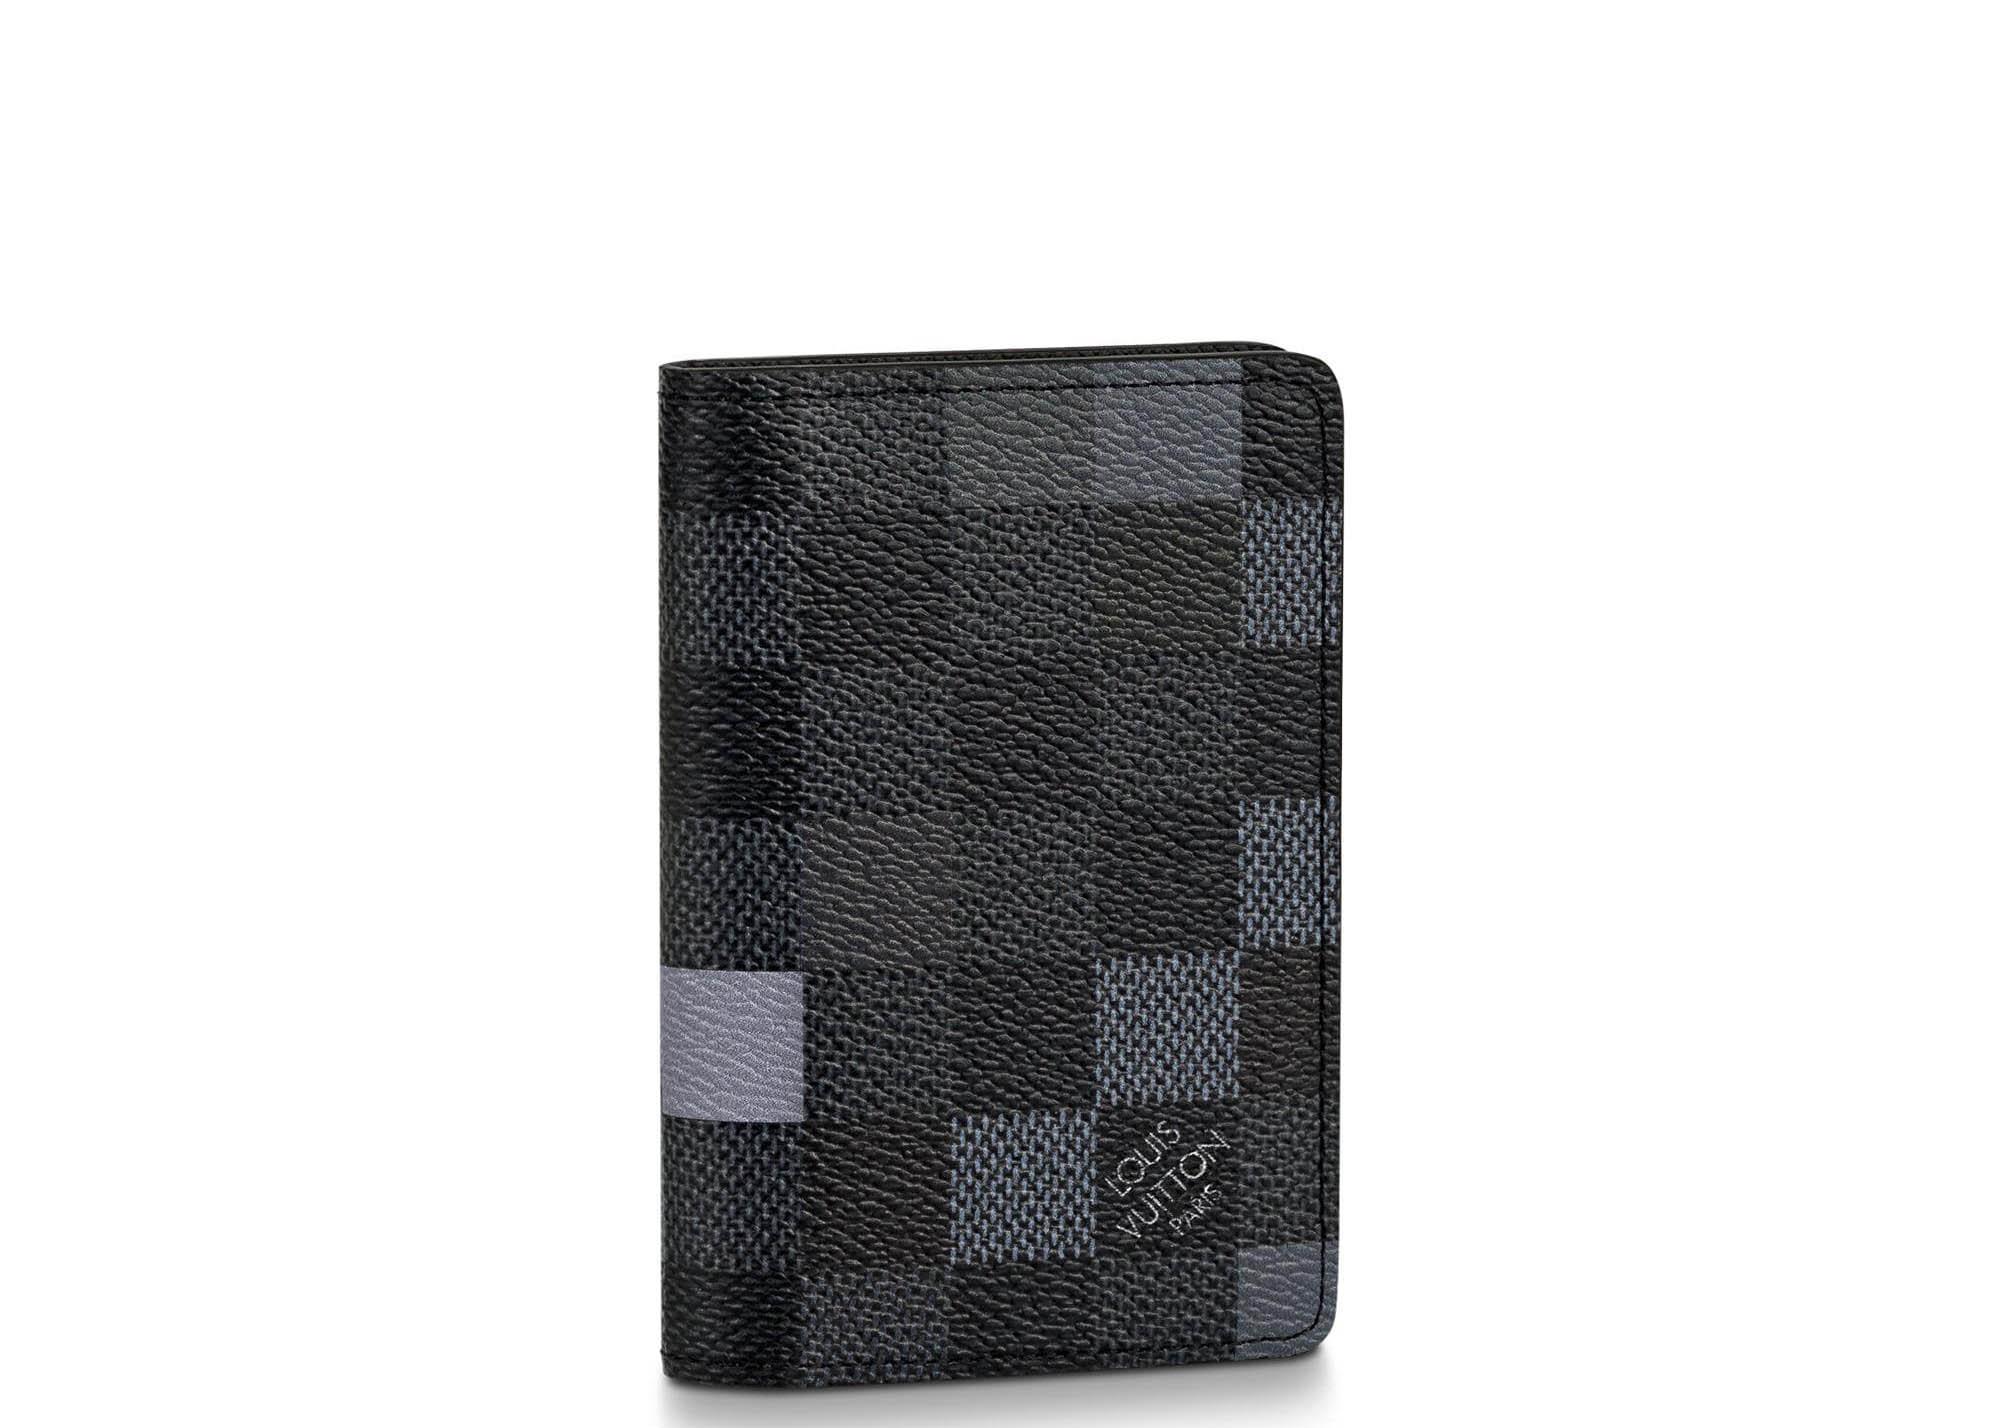 208570b36d2 Pocket Organizer Damier Graphite Pixel Gray